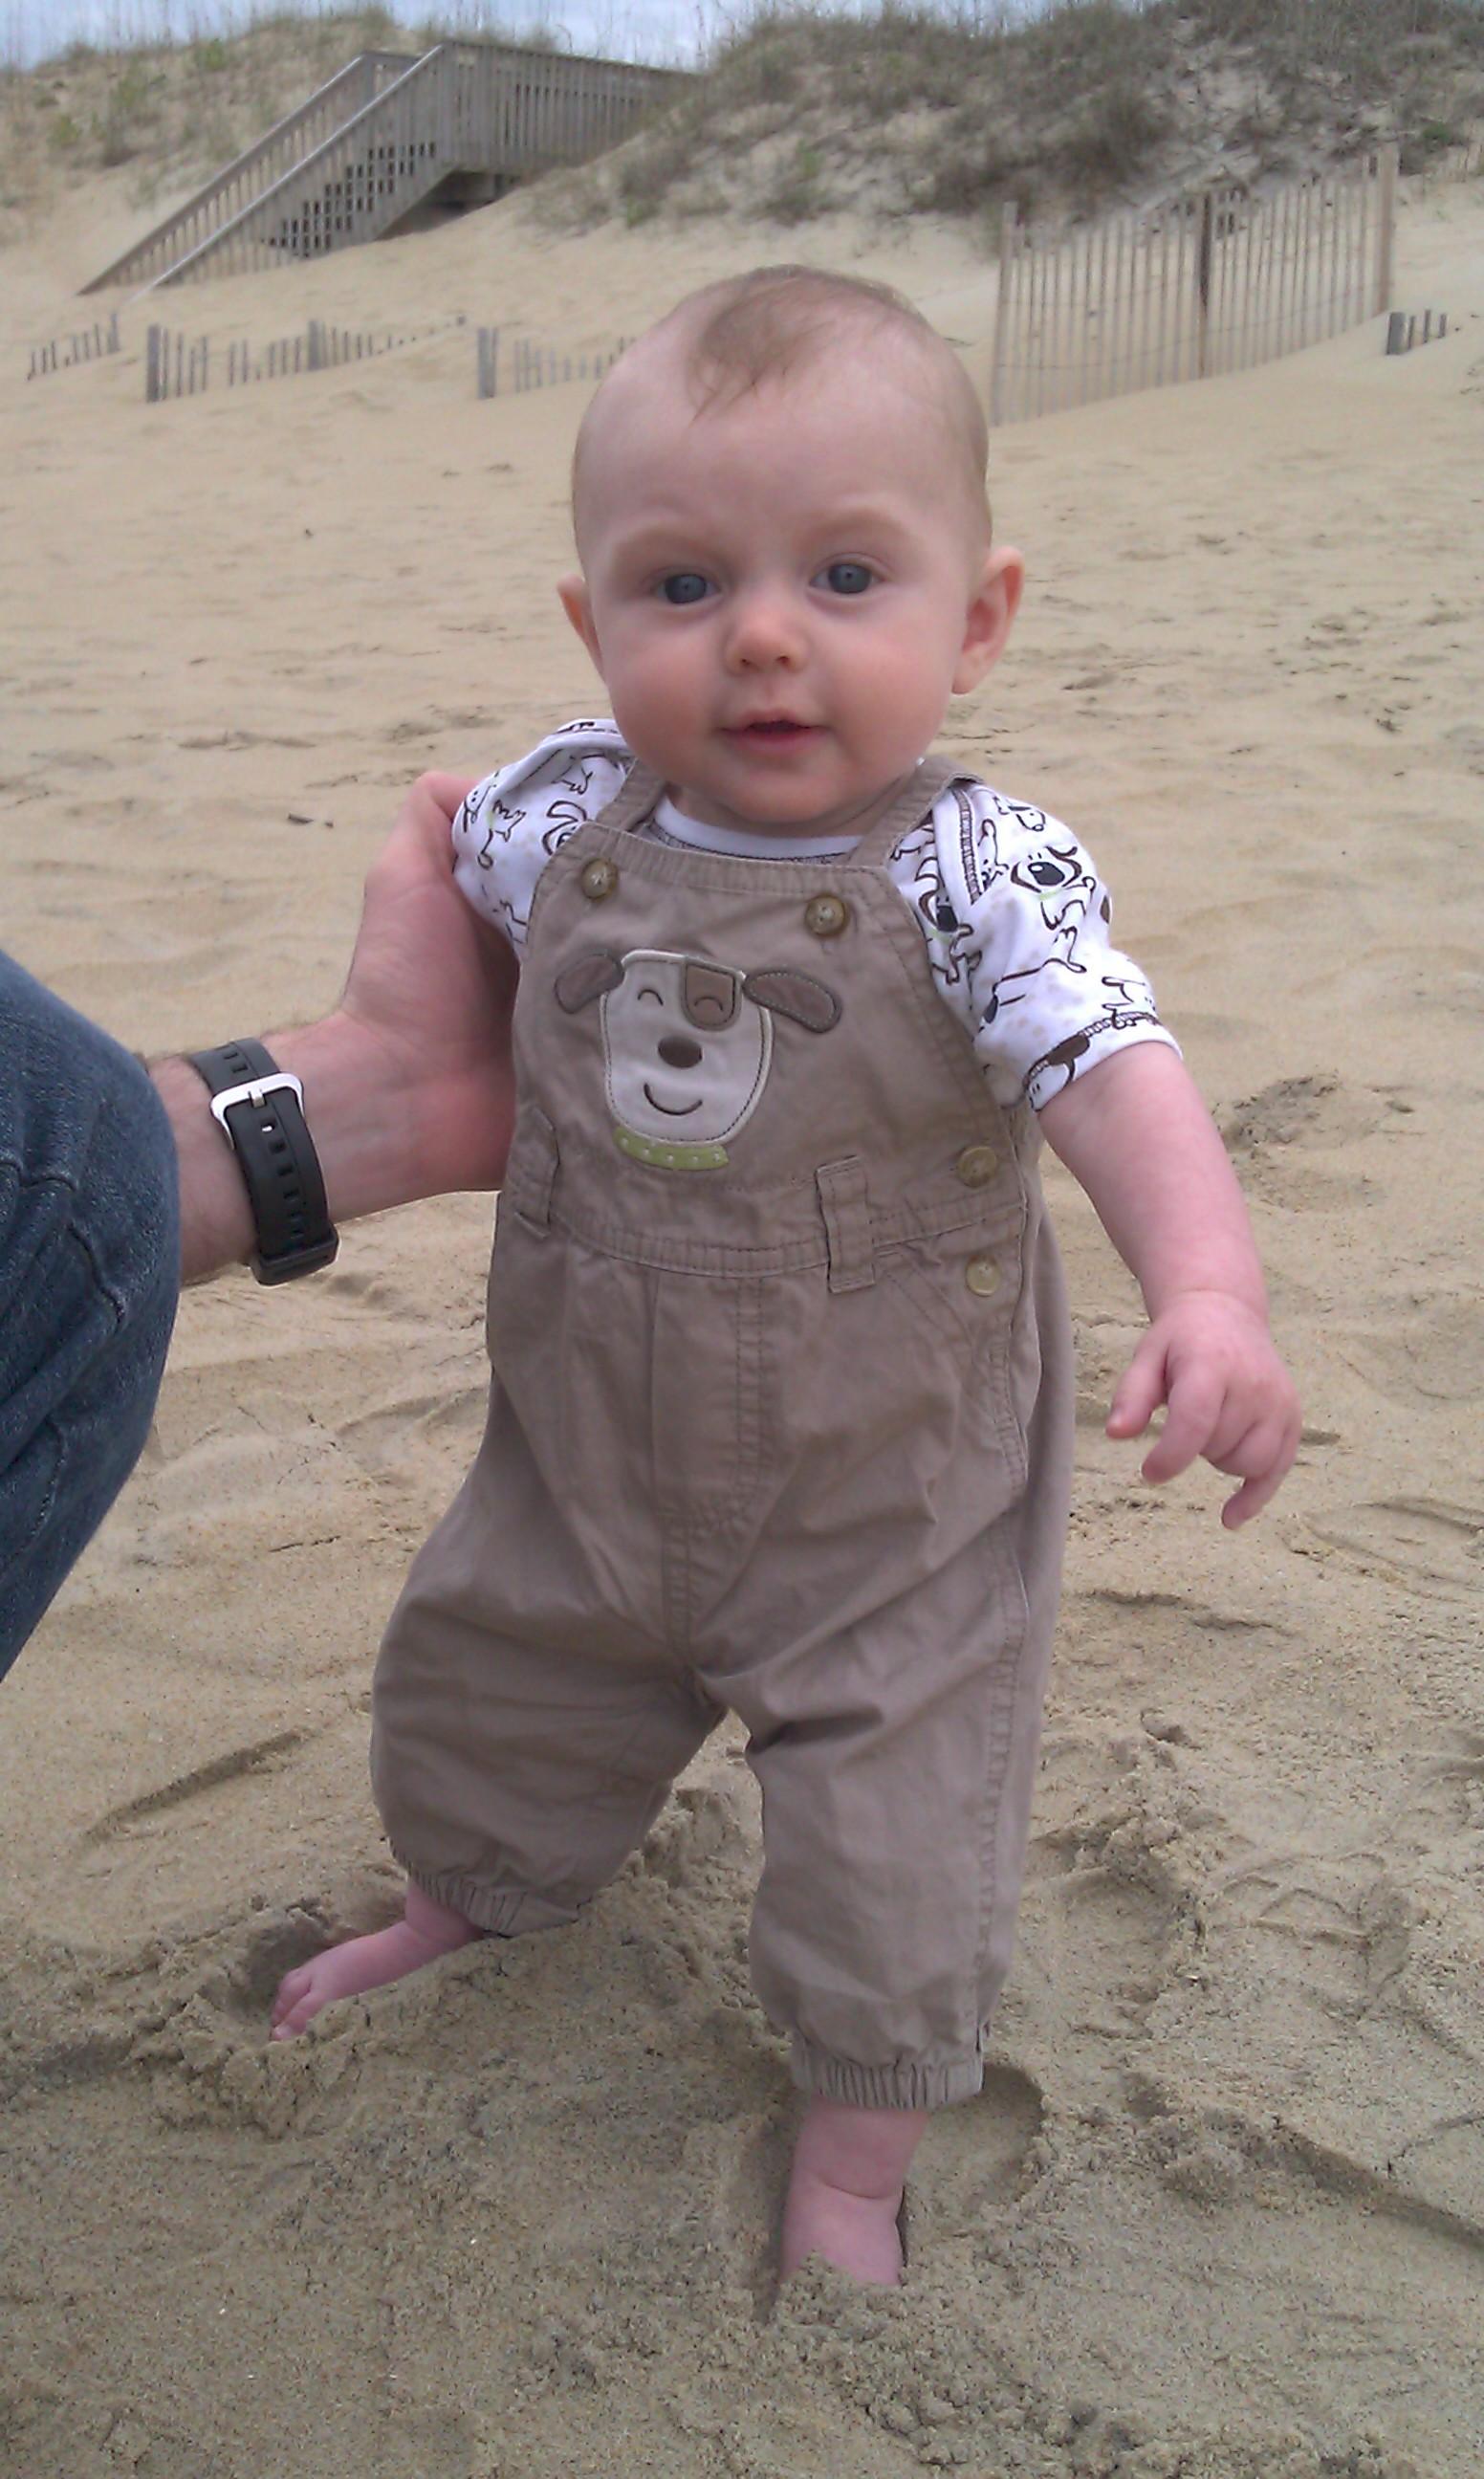 Harlan walking in the sand.